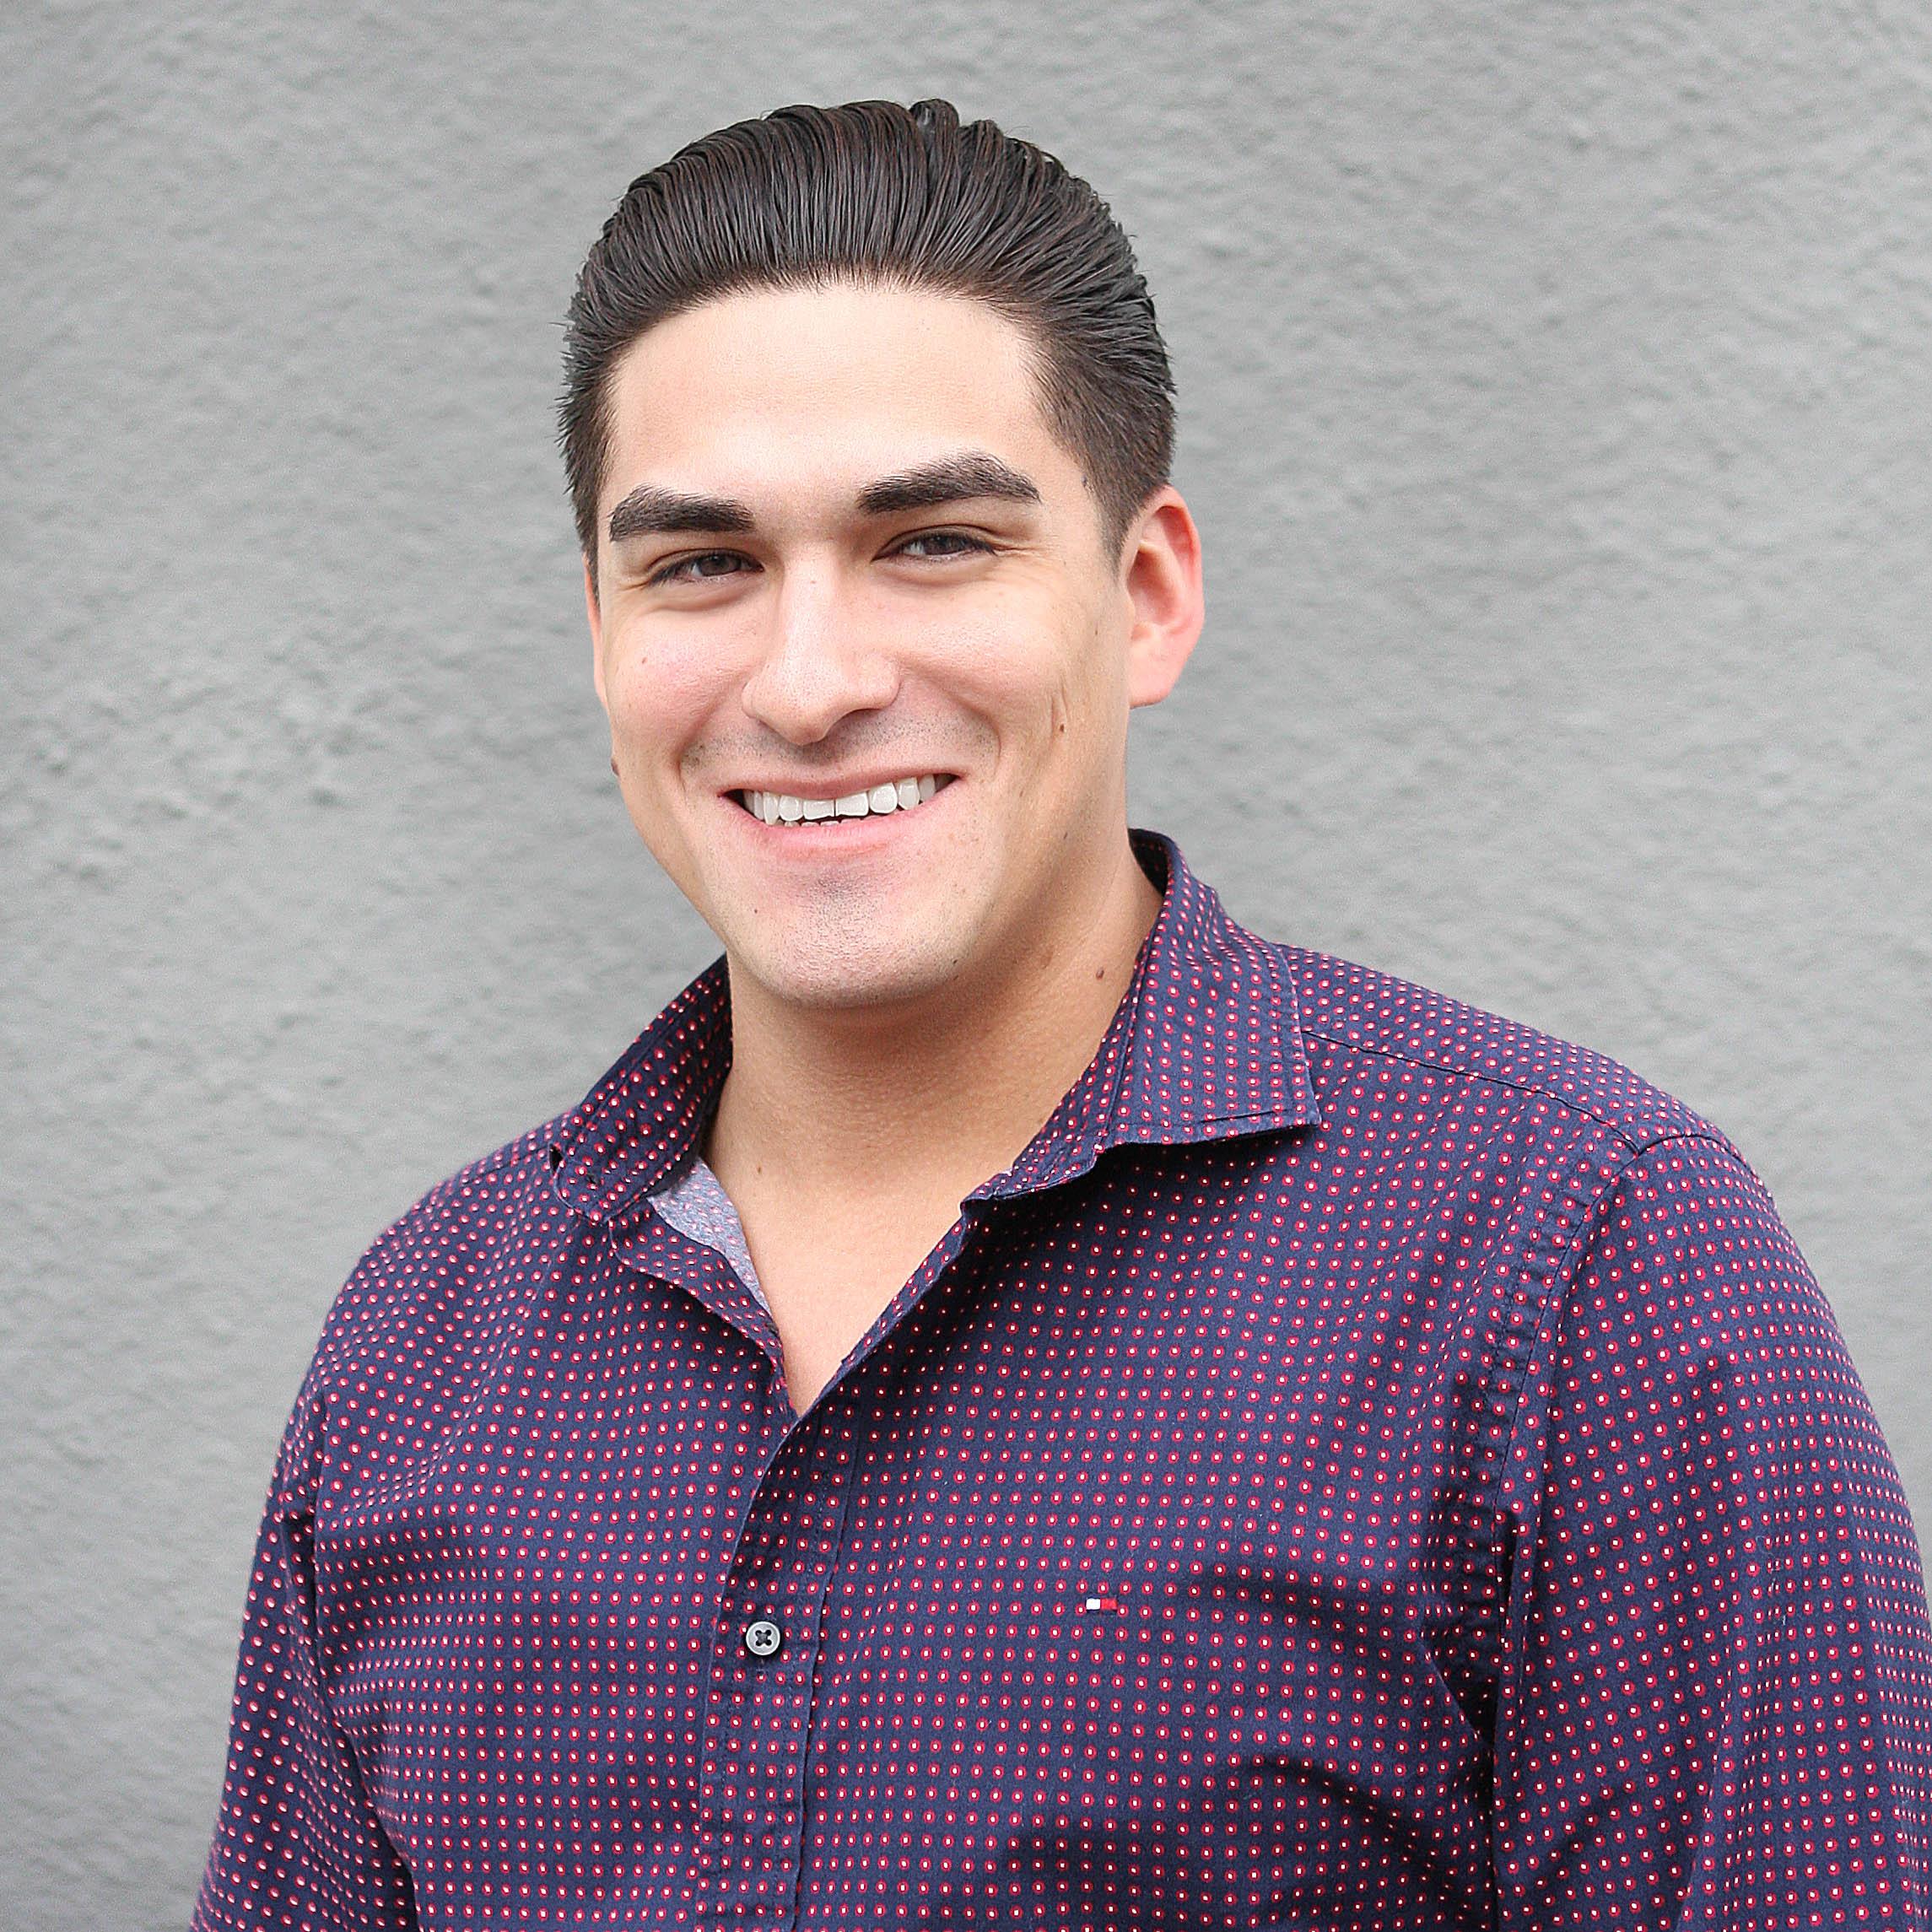 Nathaniel Dominguez